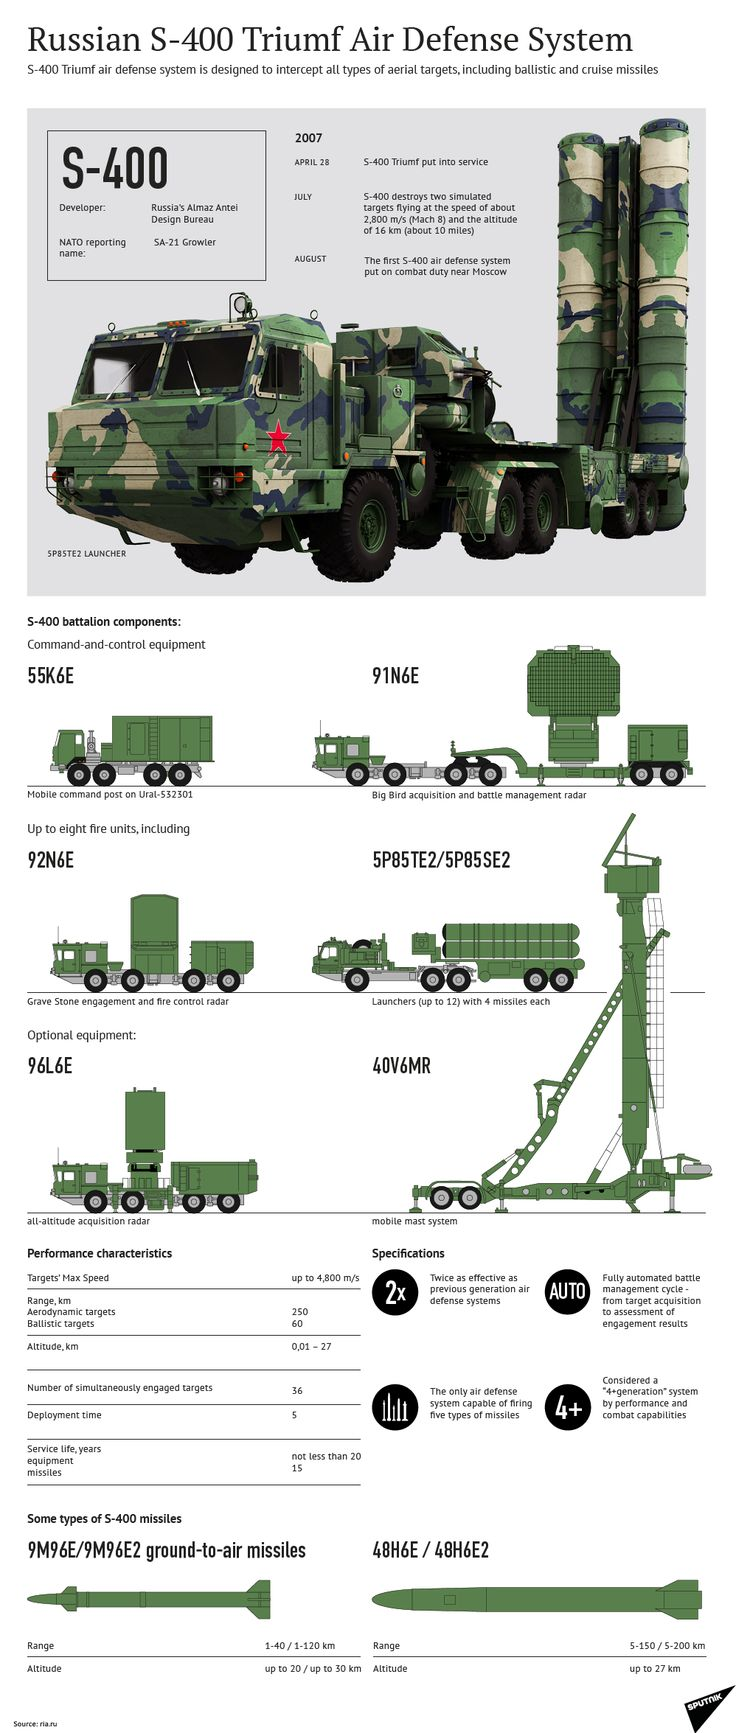 Russian S-400 Triumf Air Defense System